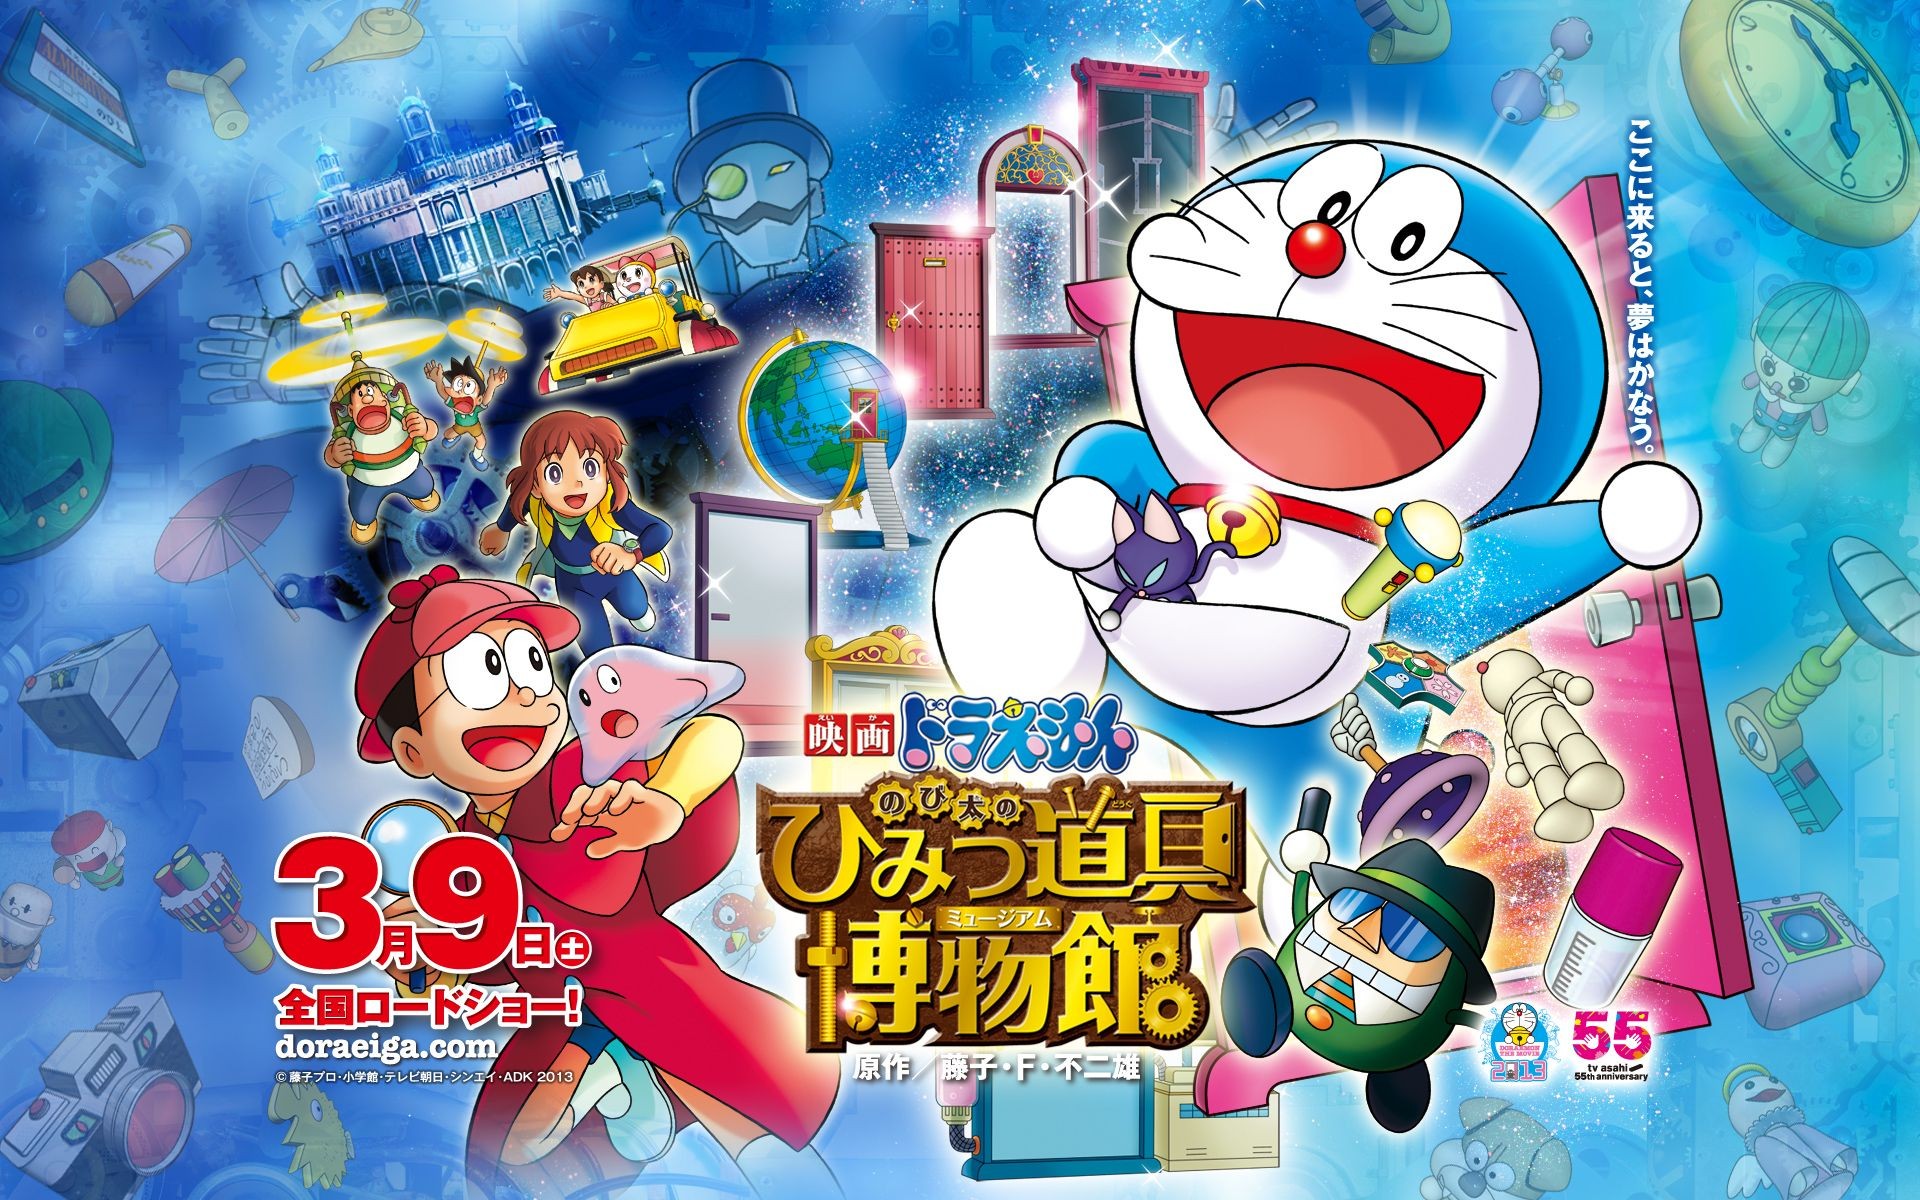 Doraemon the Movie: Nobita's Secret Gadget Museum | Live HD